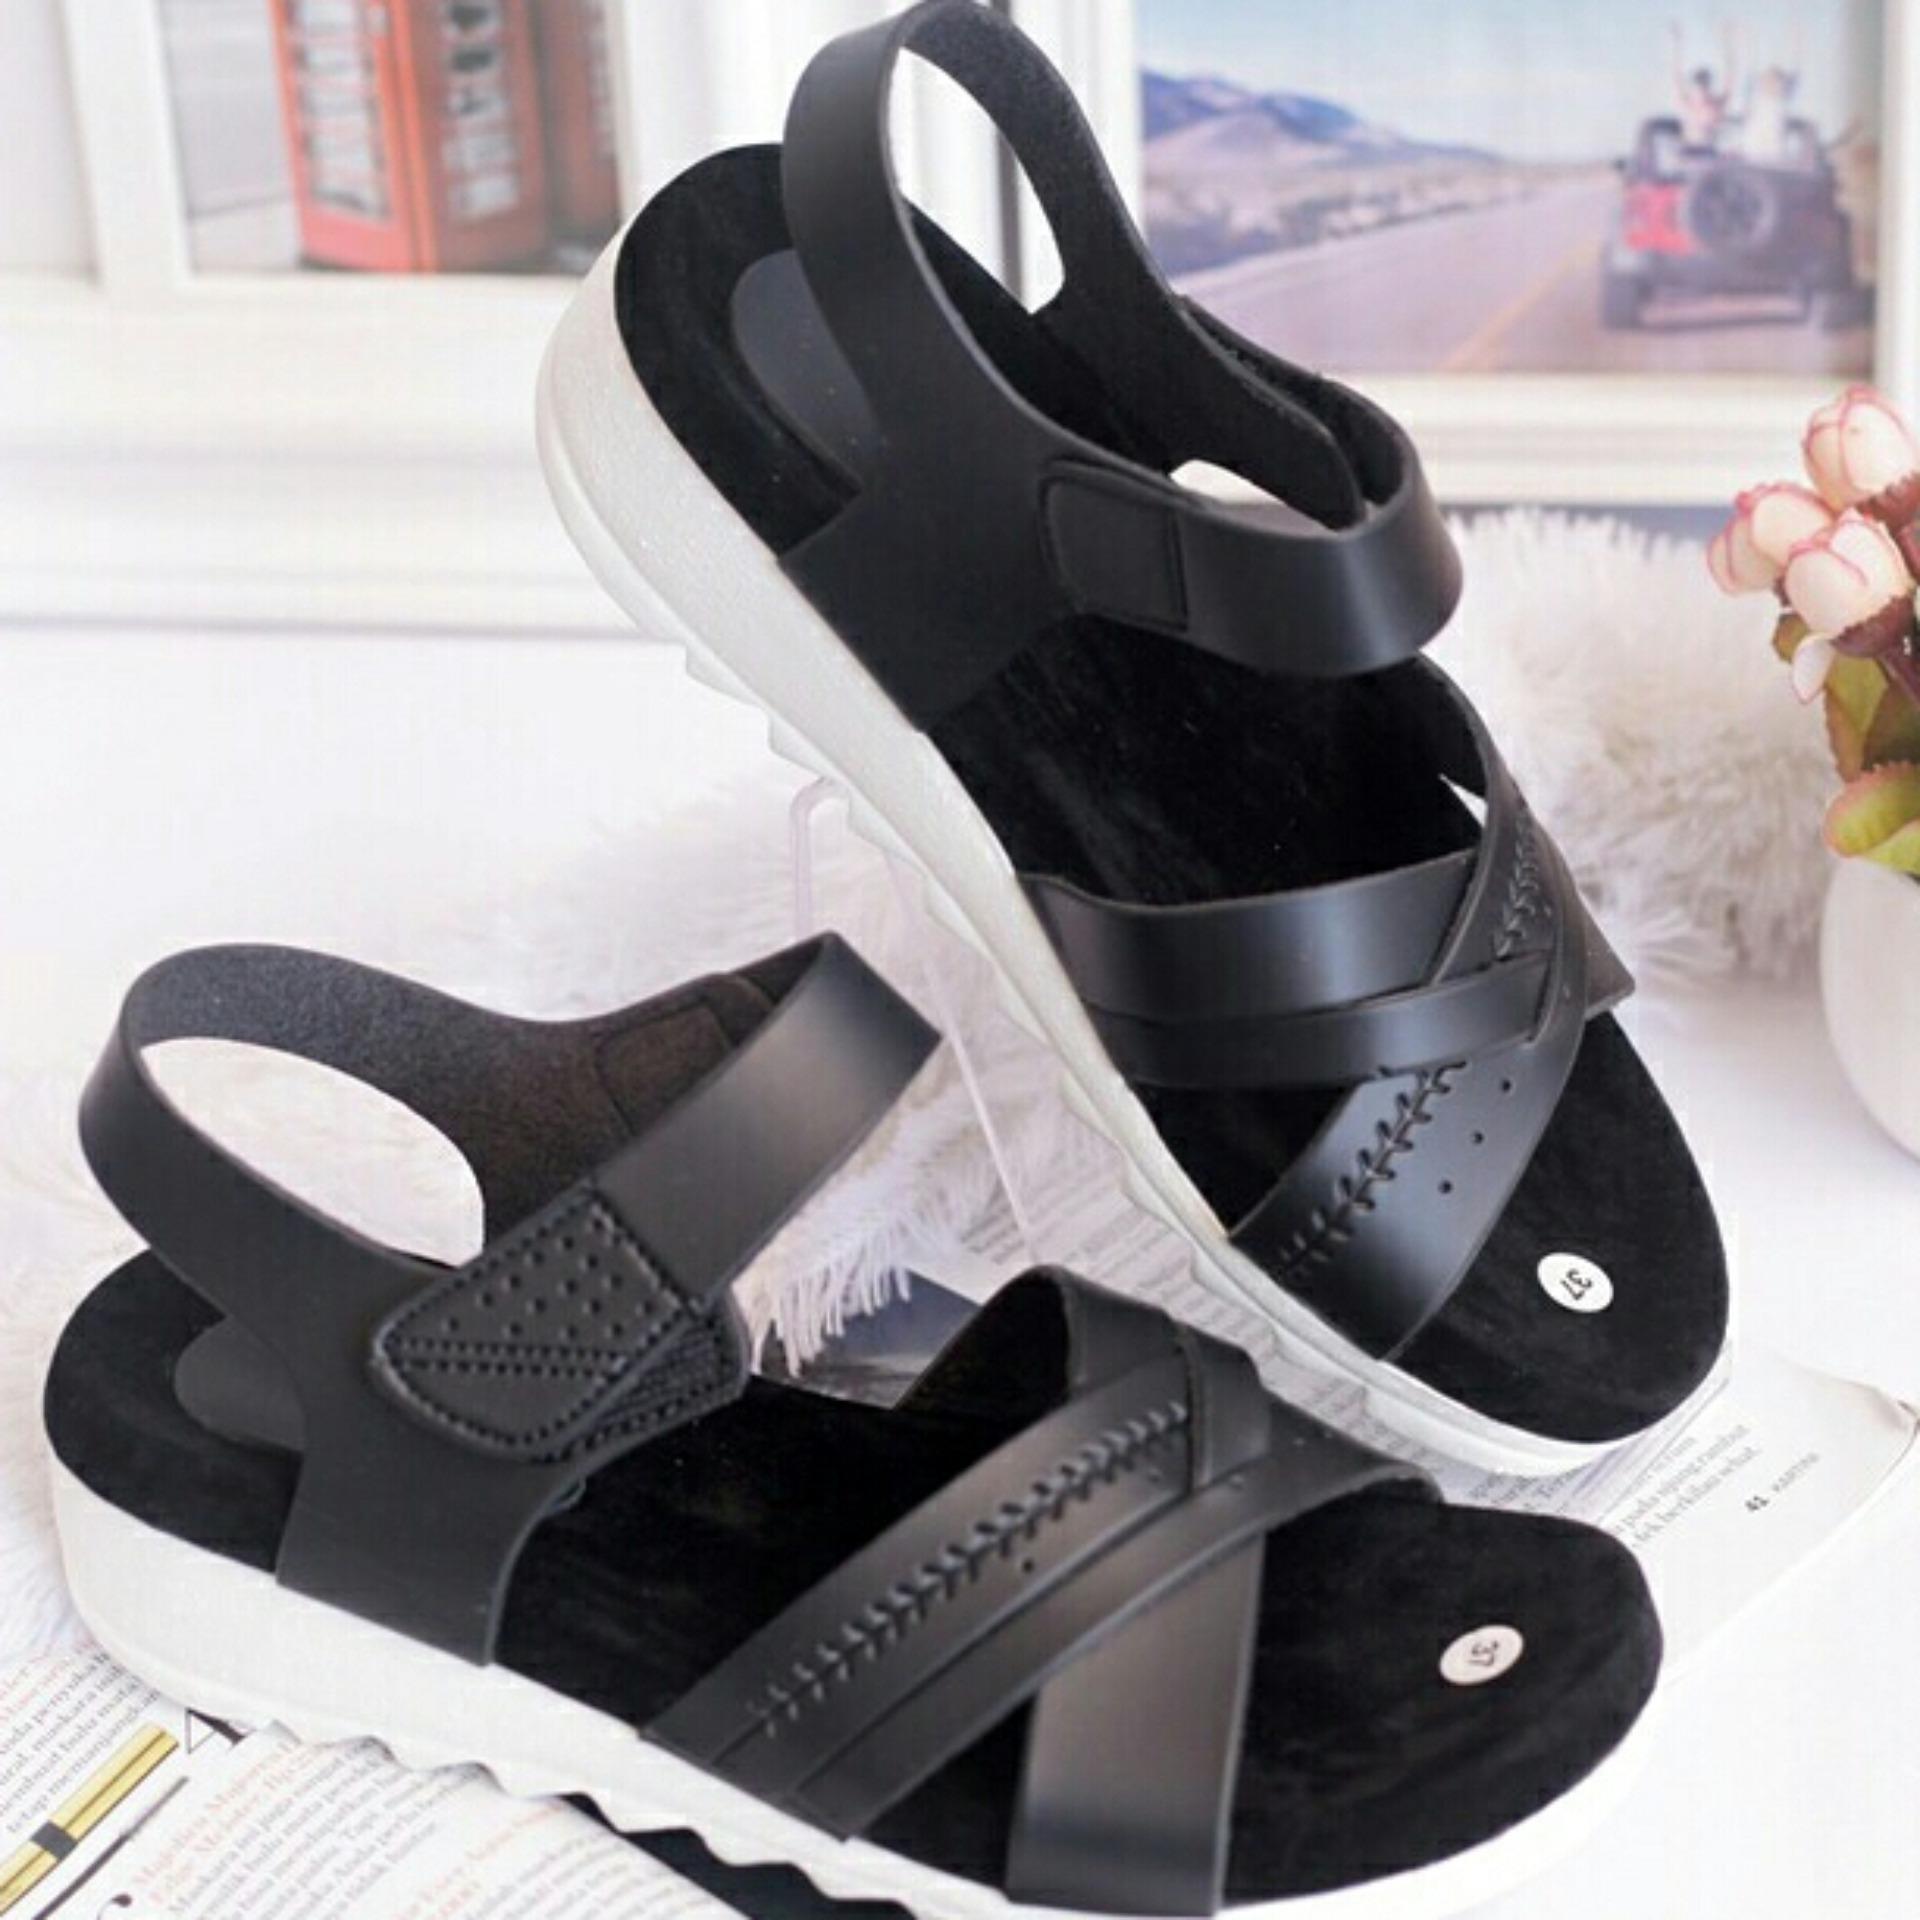 Bondshop - New Sandal Wanita Wedges Cream ( Sepatu / Sendal Cewek )